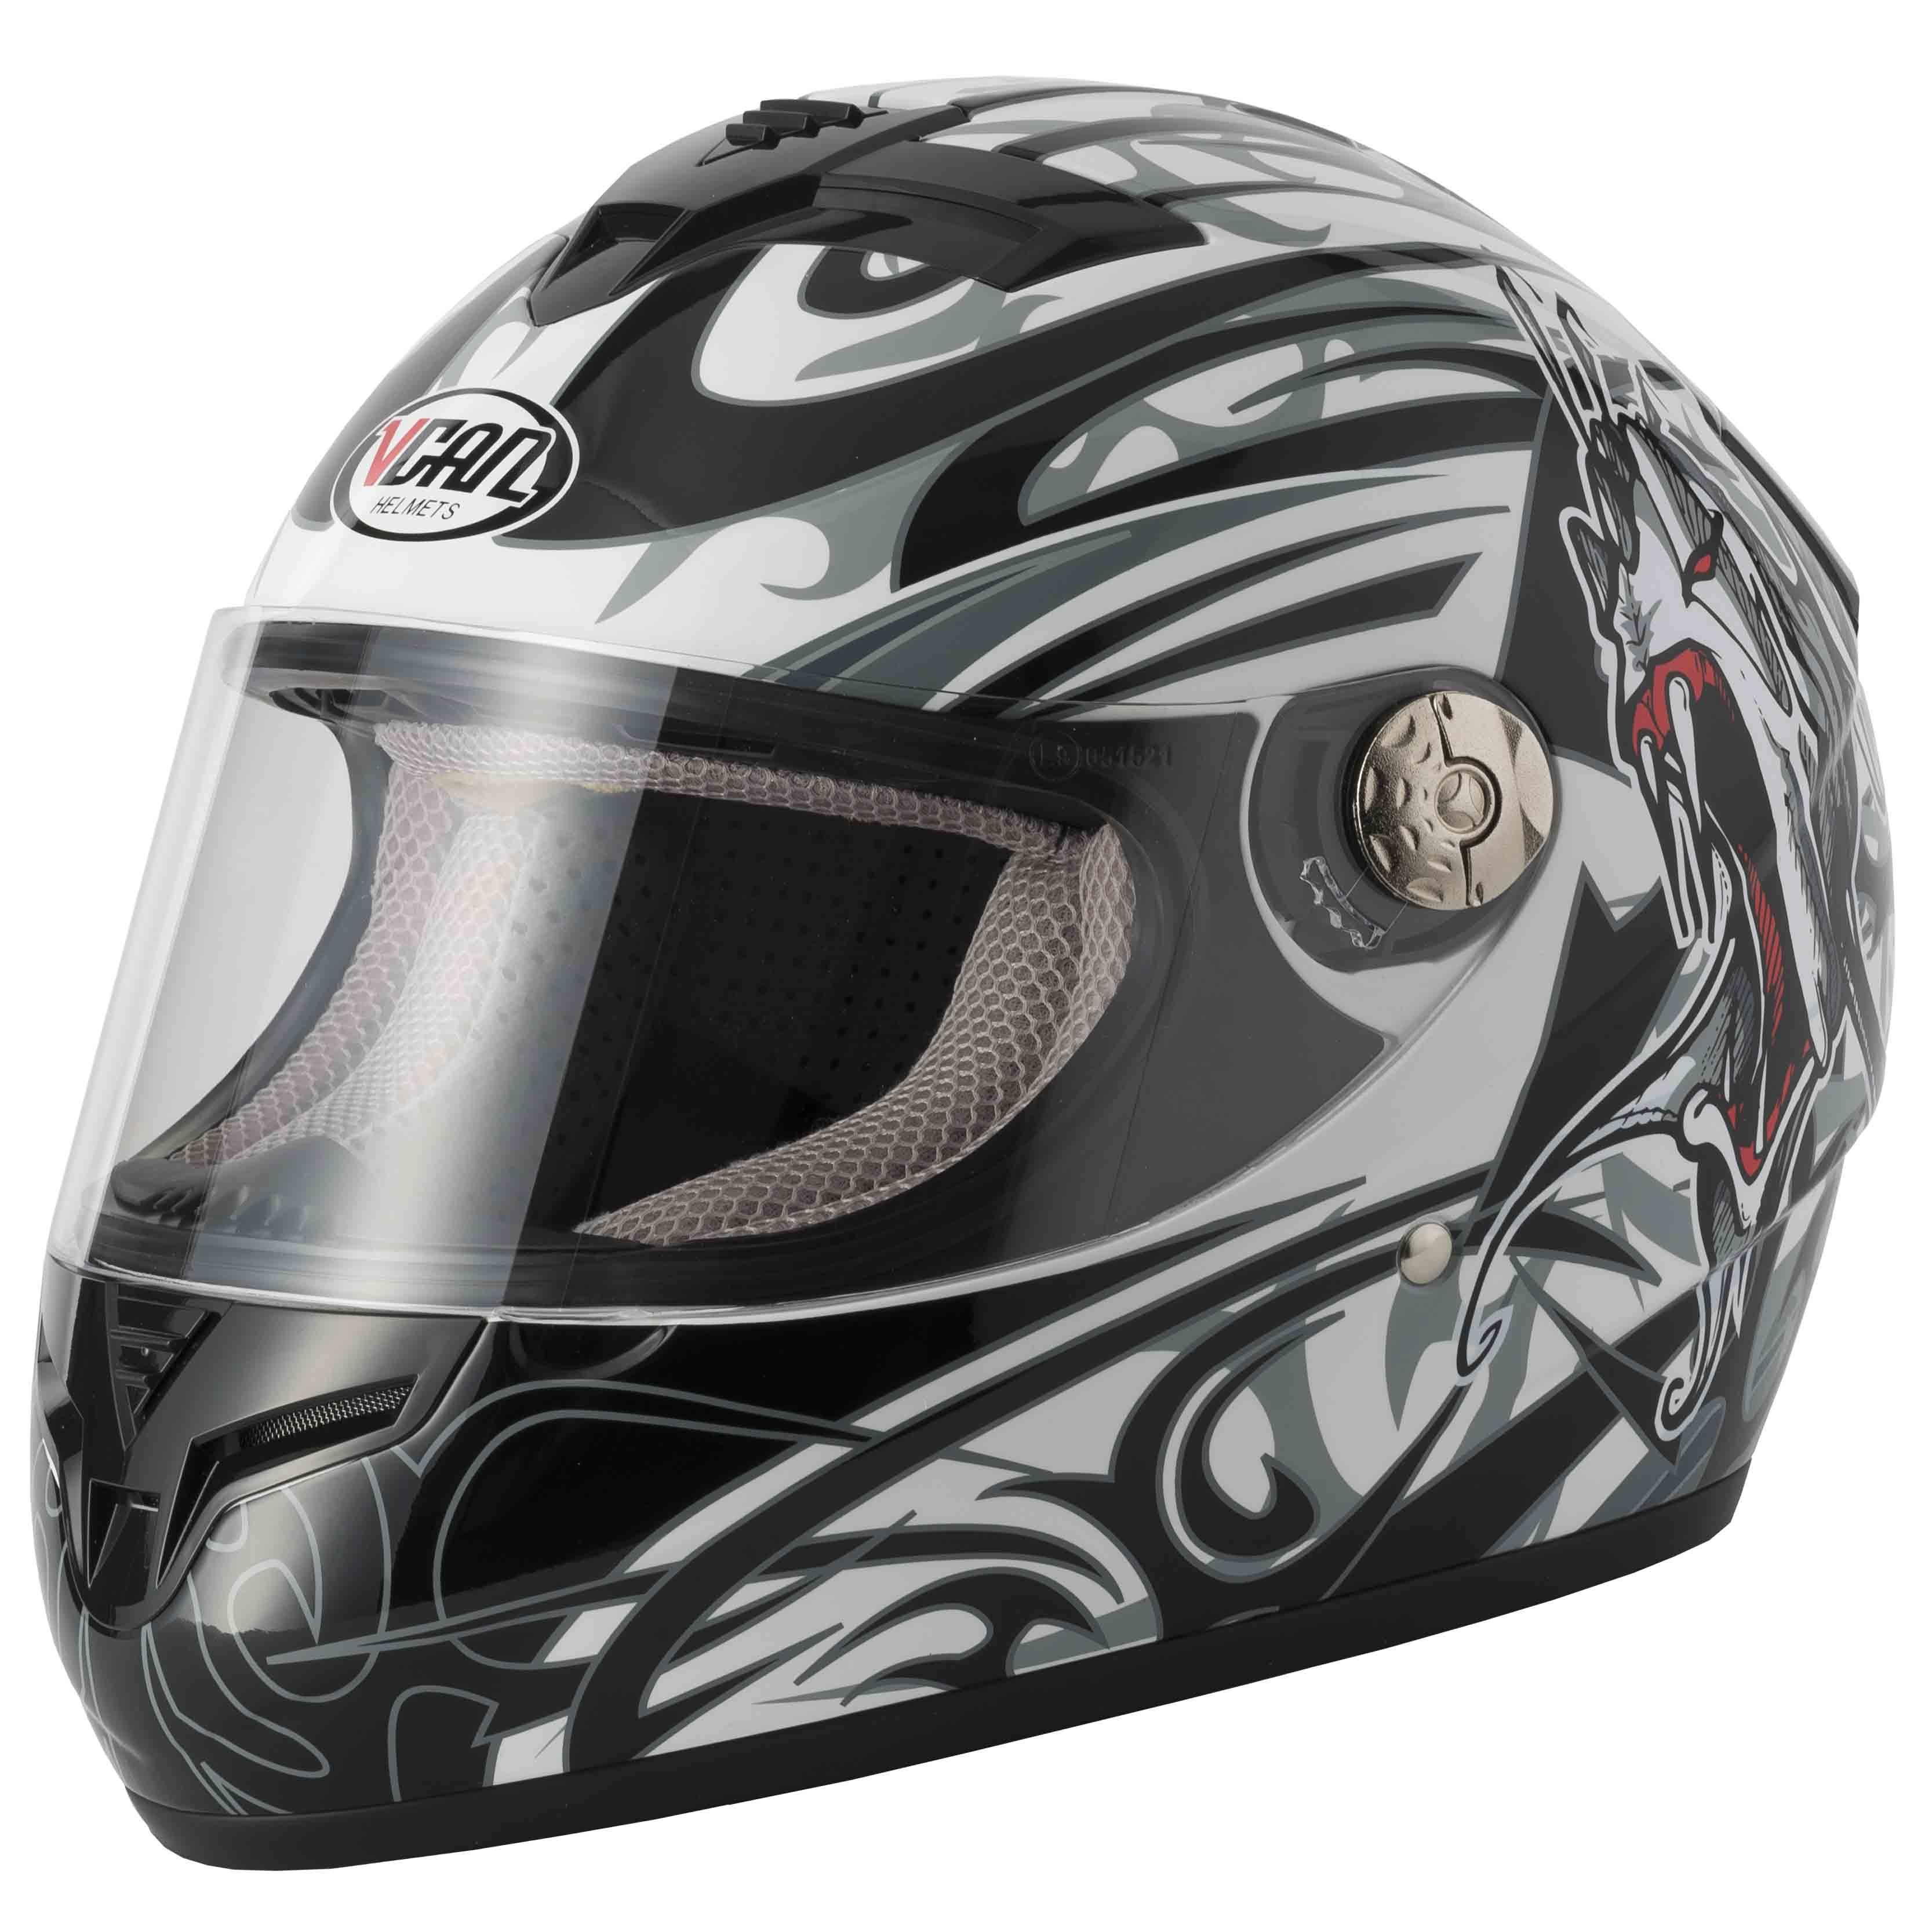 MOTORBIKE VCAN V127 UK BRITISH FLAG HELMET Motorcycle Full Face Union Jack Graphic ACU ECE Approved Sports Touring Helmet /& Grid Balaclava